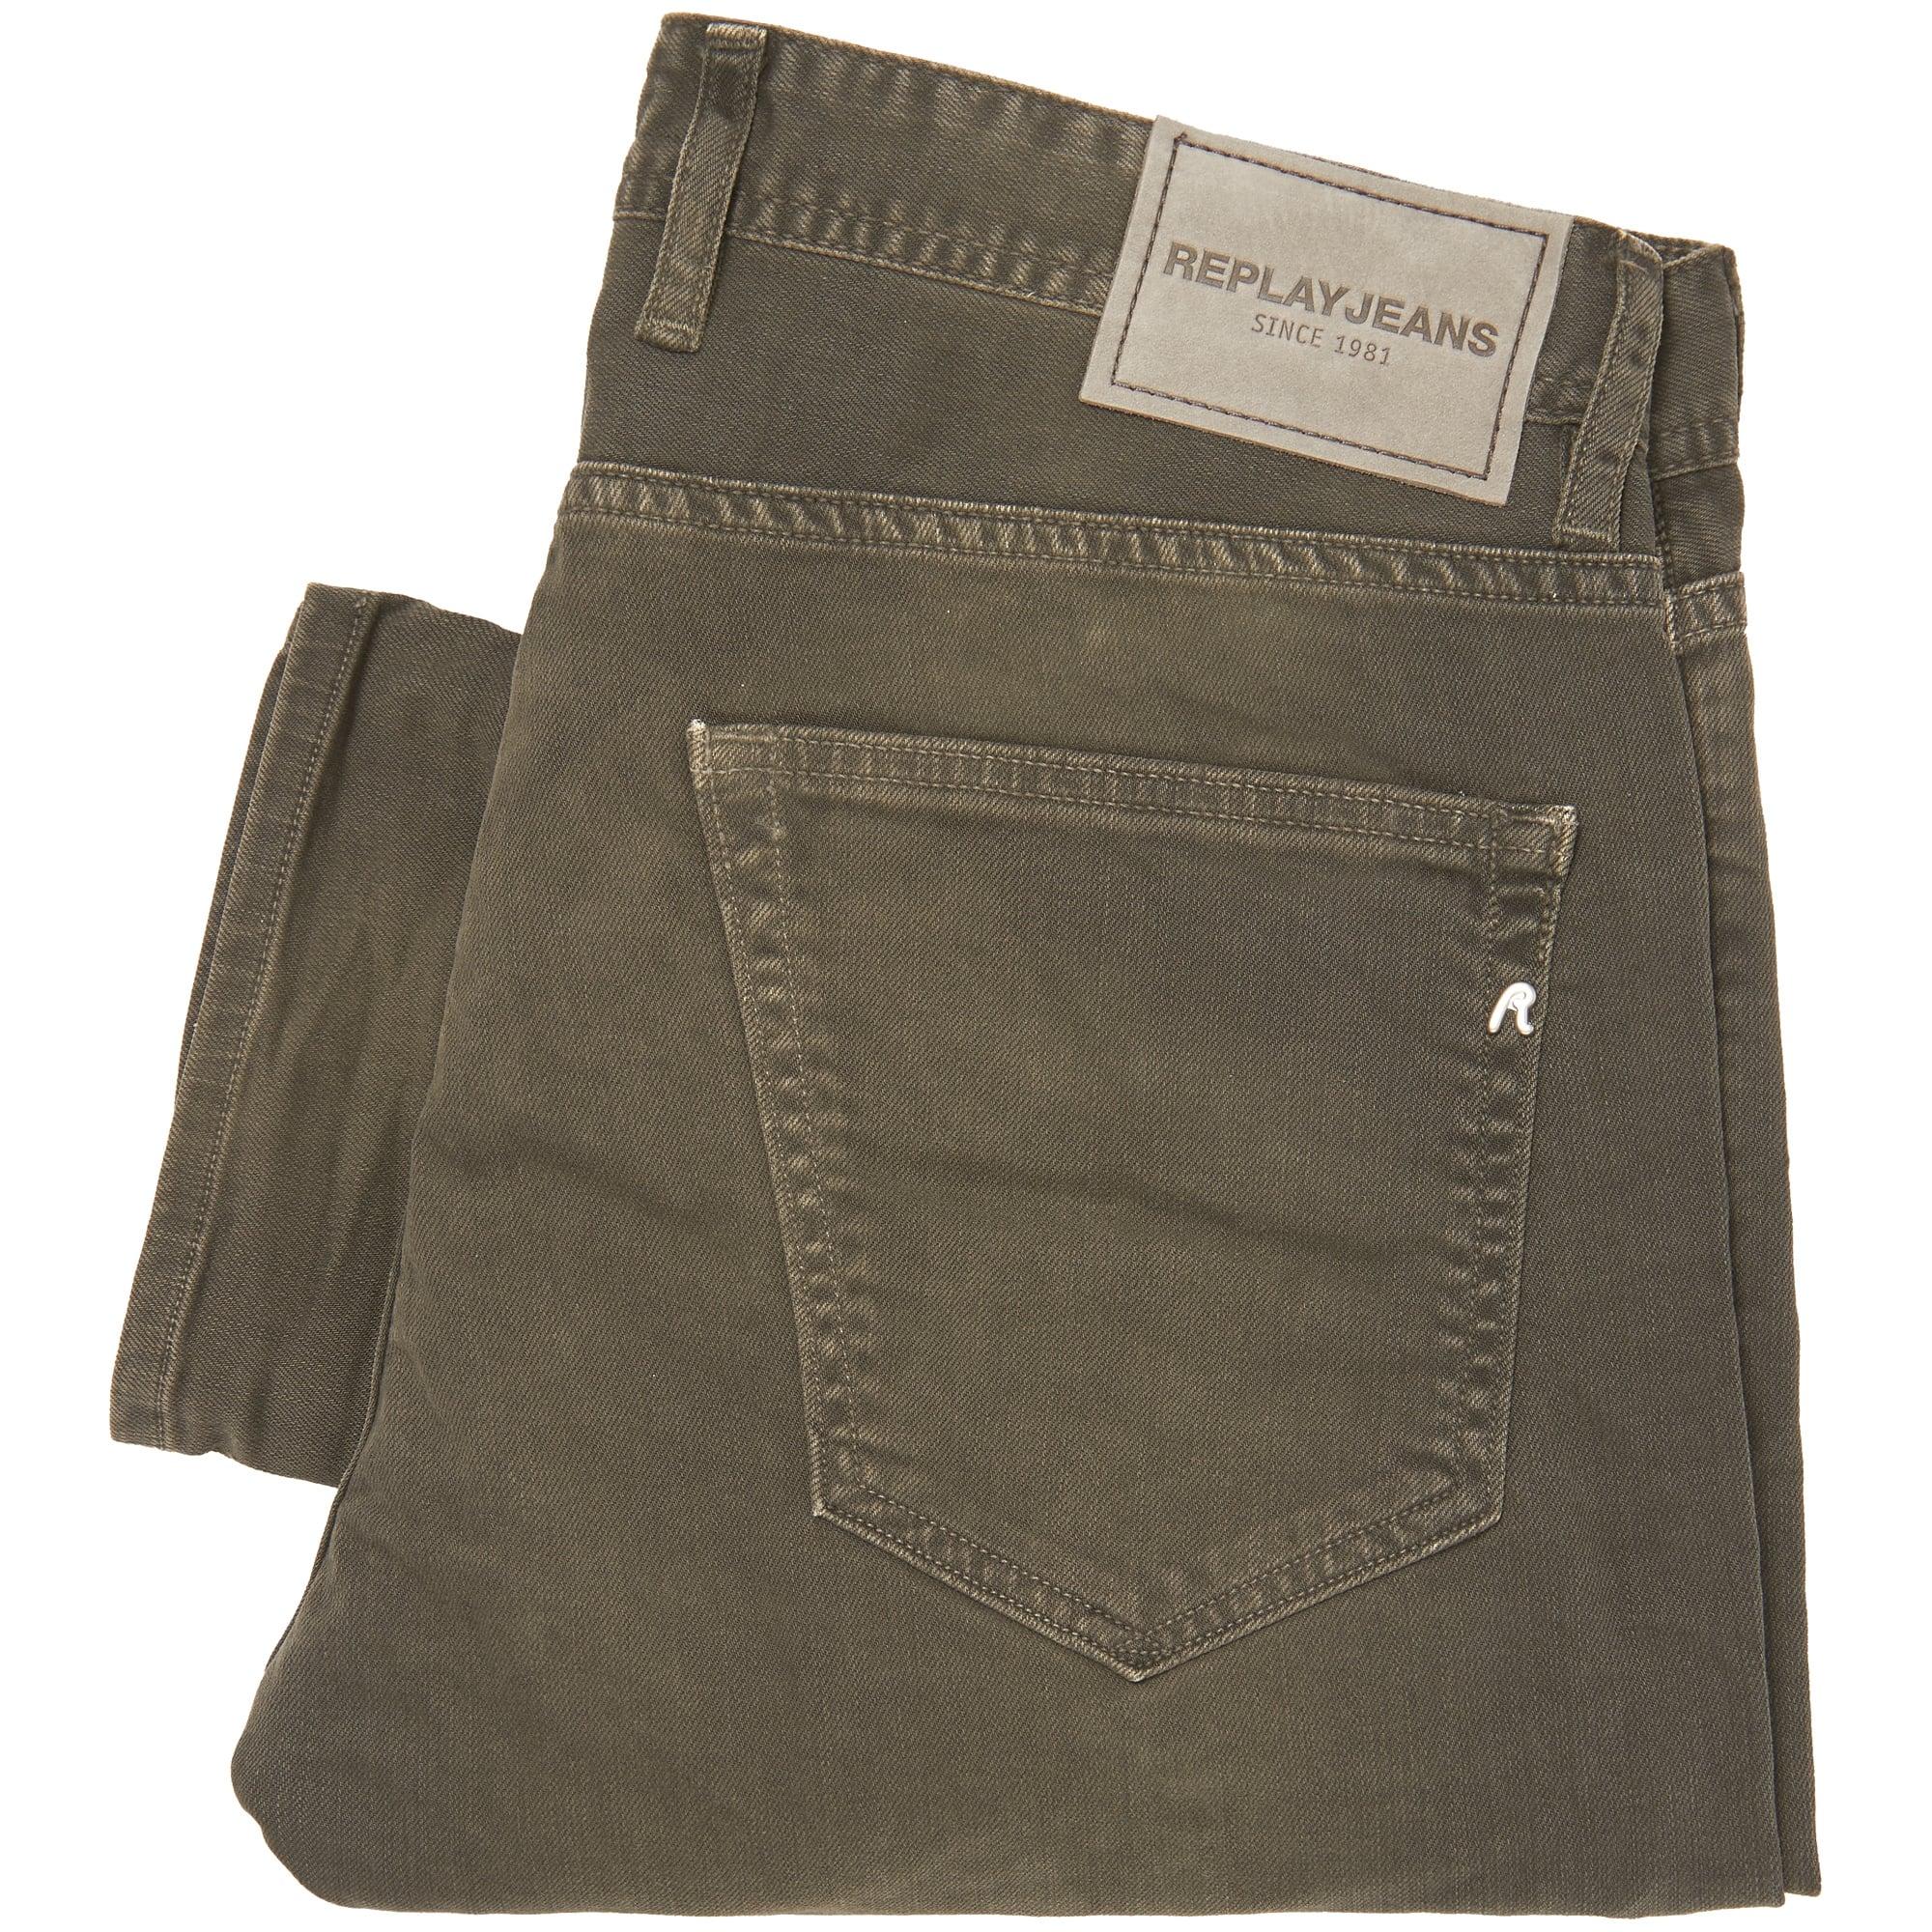 Replay Jeans Green Grover Jeans MA972-040   Stuarts London e2c56c7e67